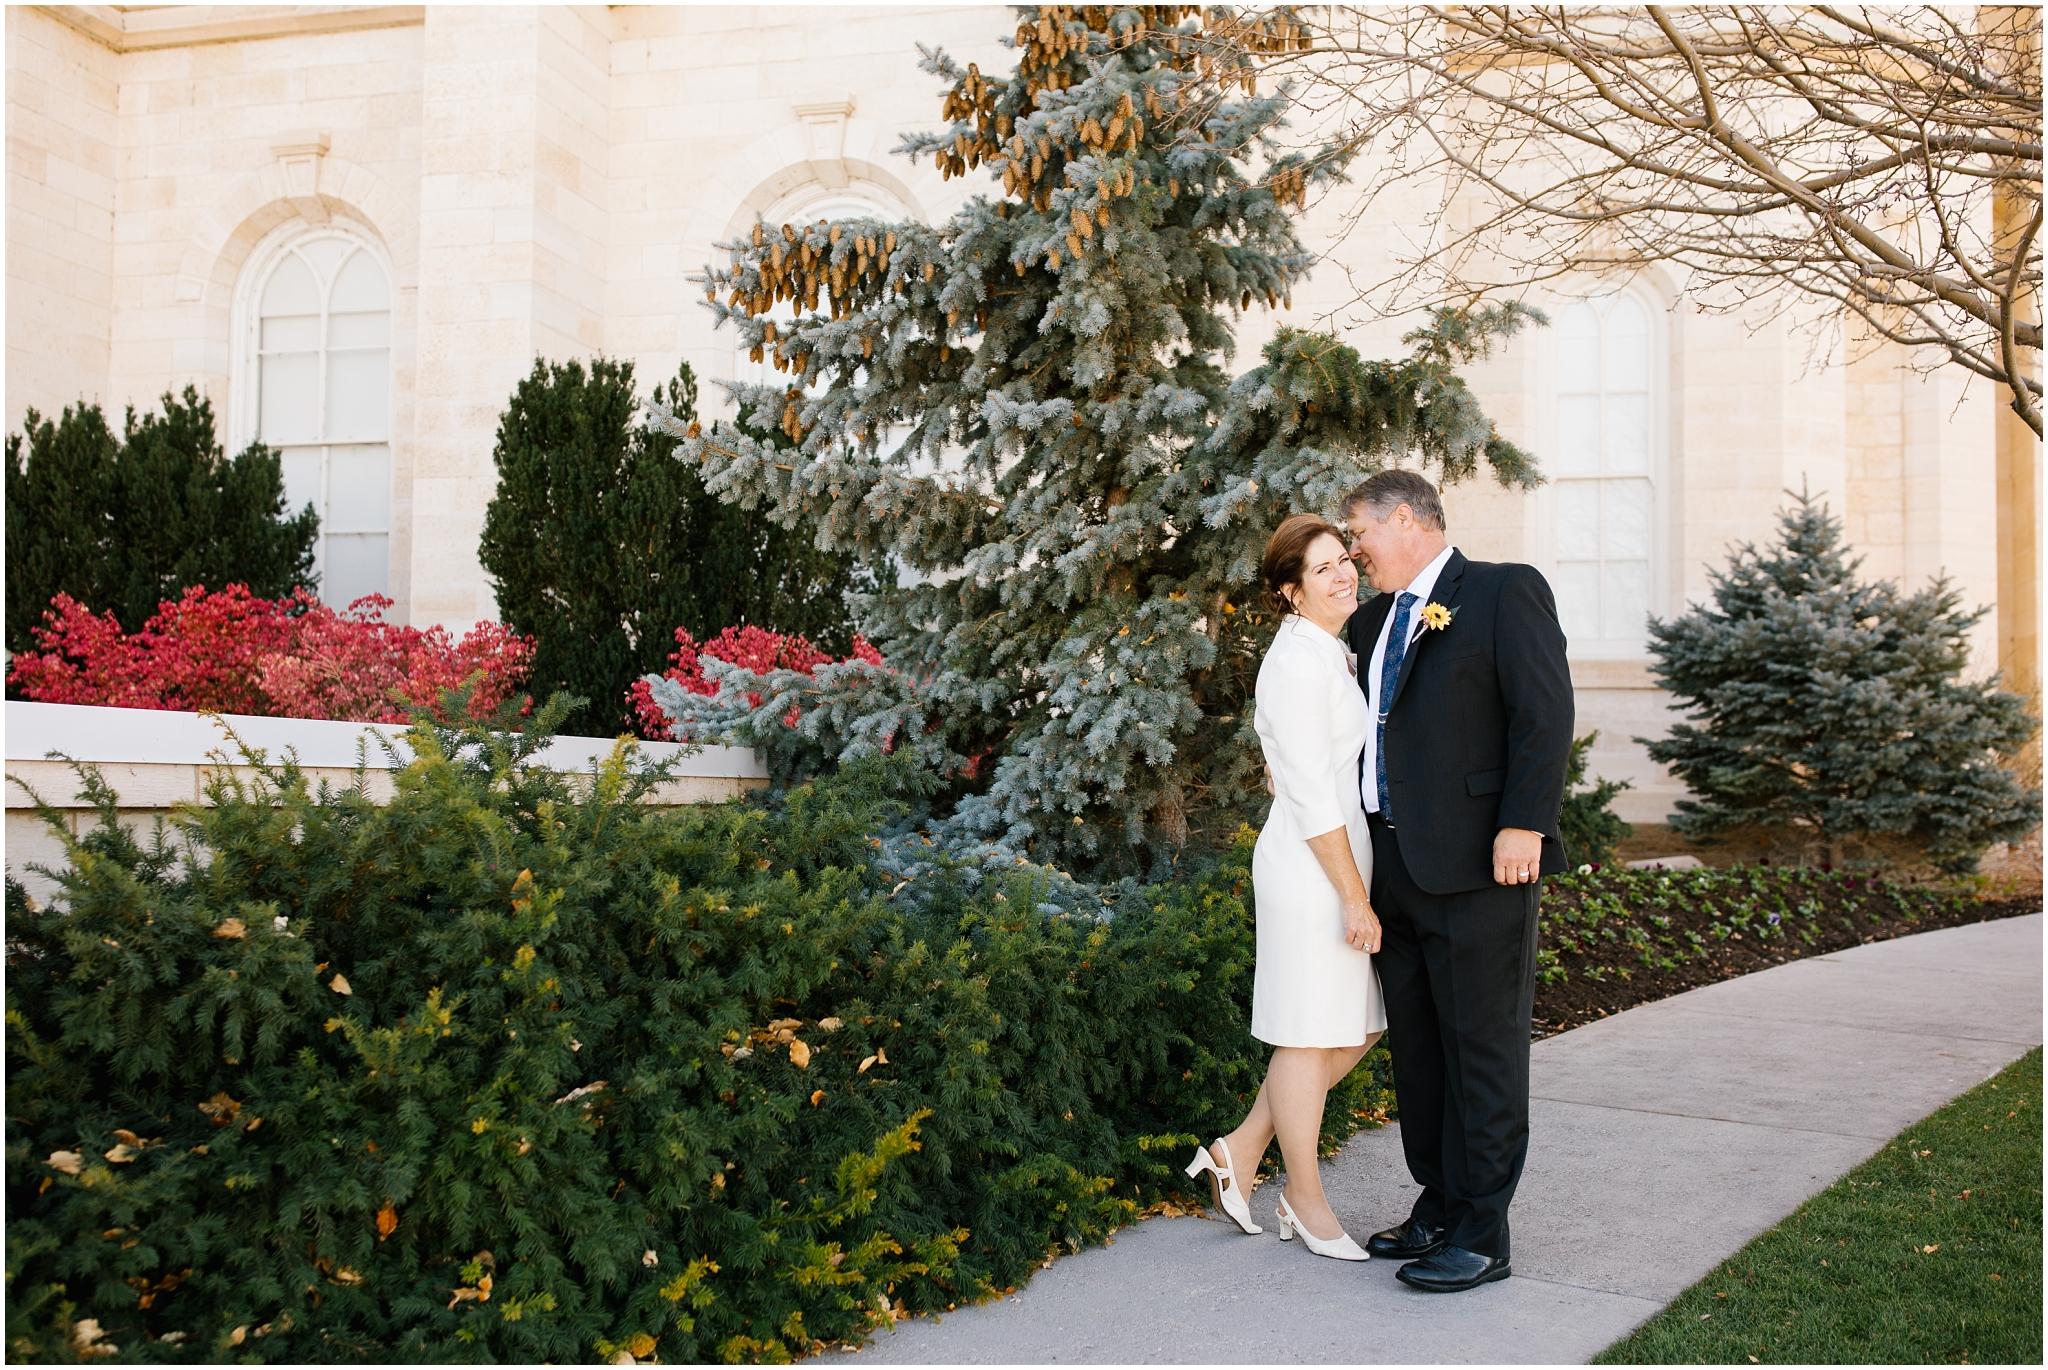 PDWeddingDay-118_Lizzie-B-Imagery-Utah-Wedding-Photographer-Salt-Lake-City-Park-City-Utah-County-Manti-Temple.jpg